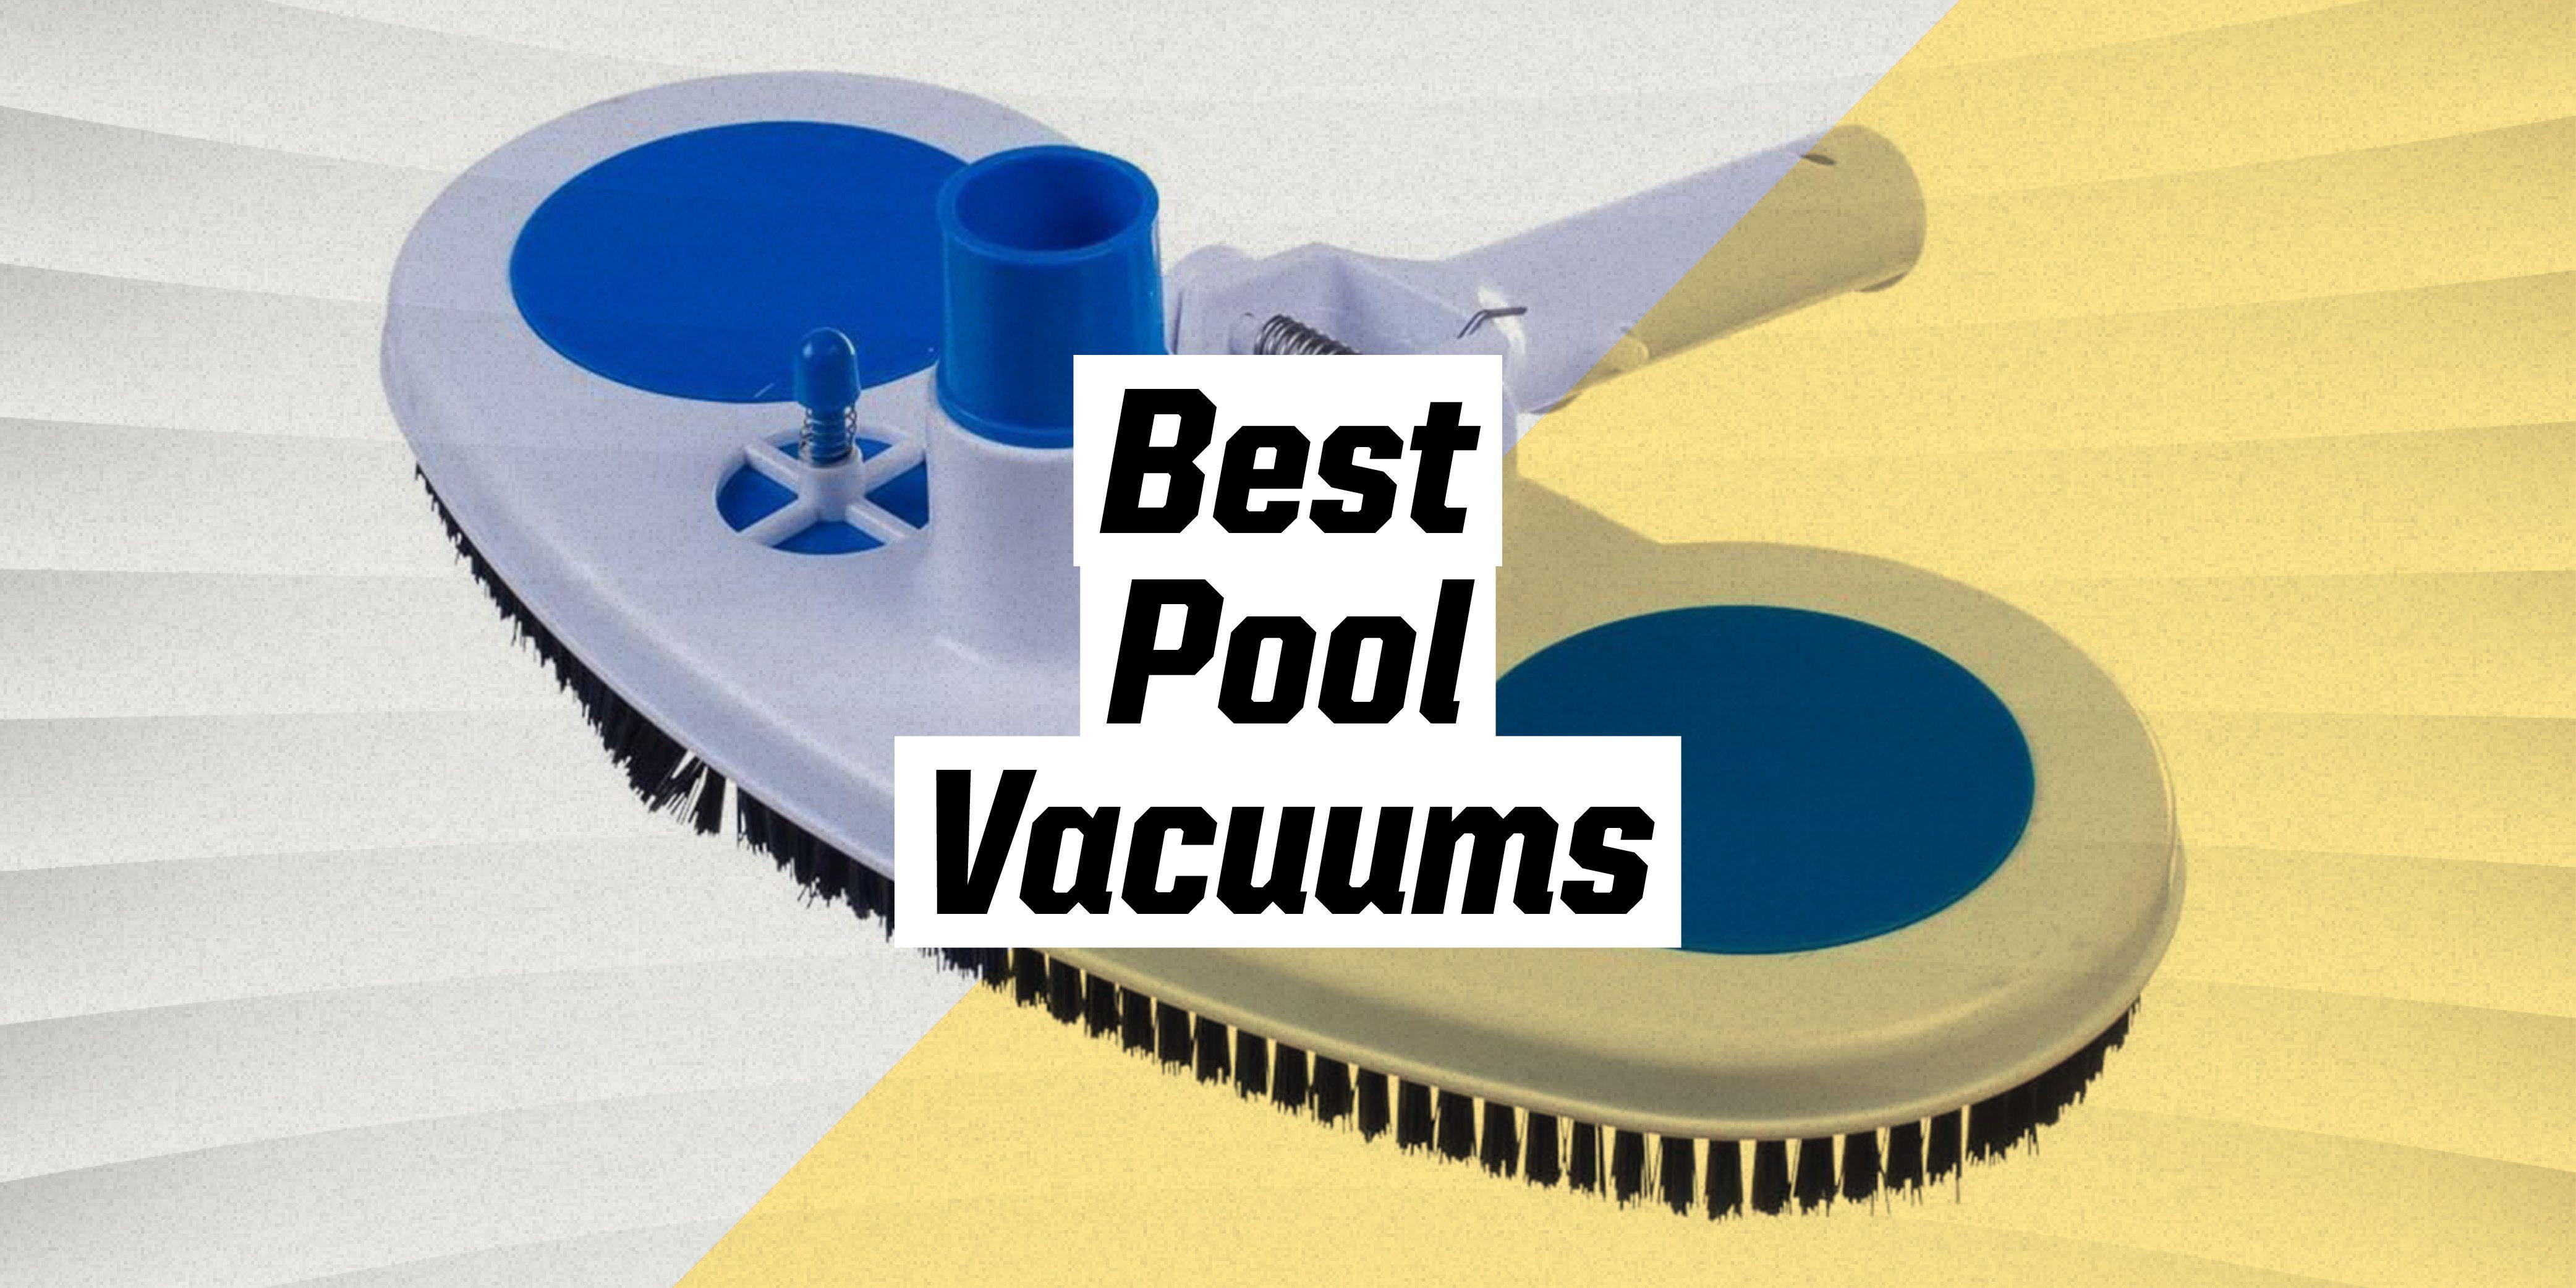 8 Best Pool Vacuums To Buy In 2021 Automatic Manual Pool Vacuums